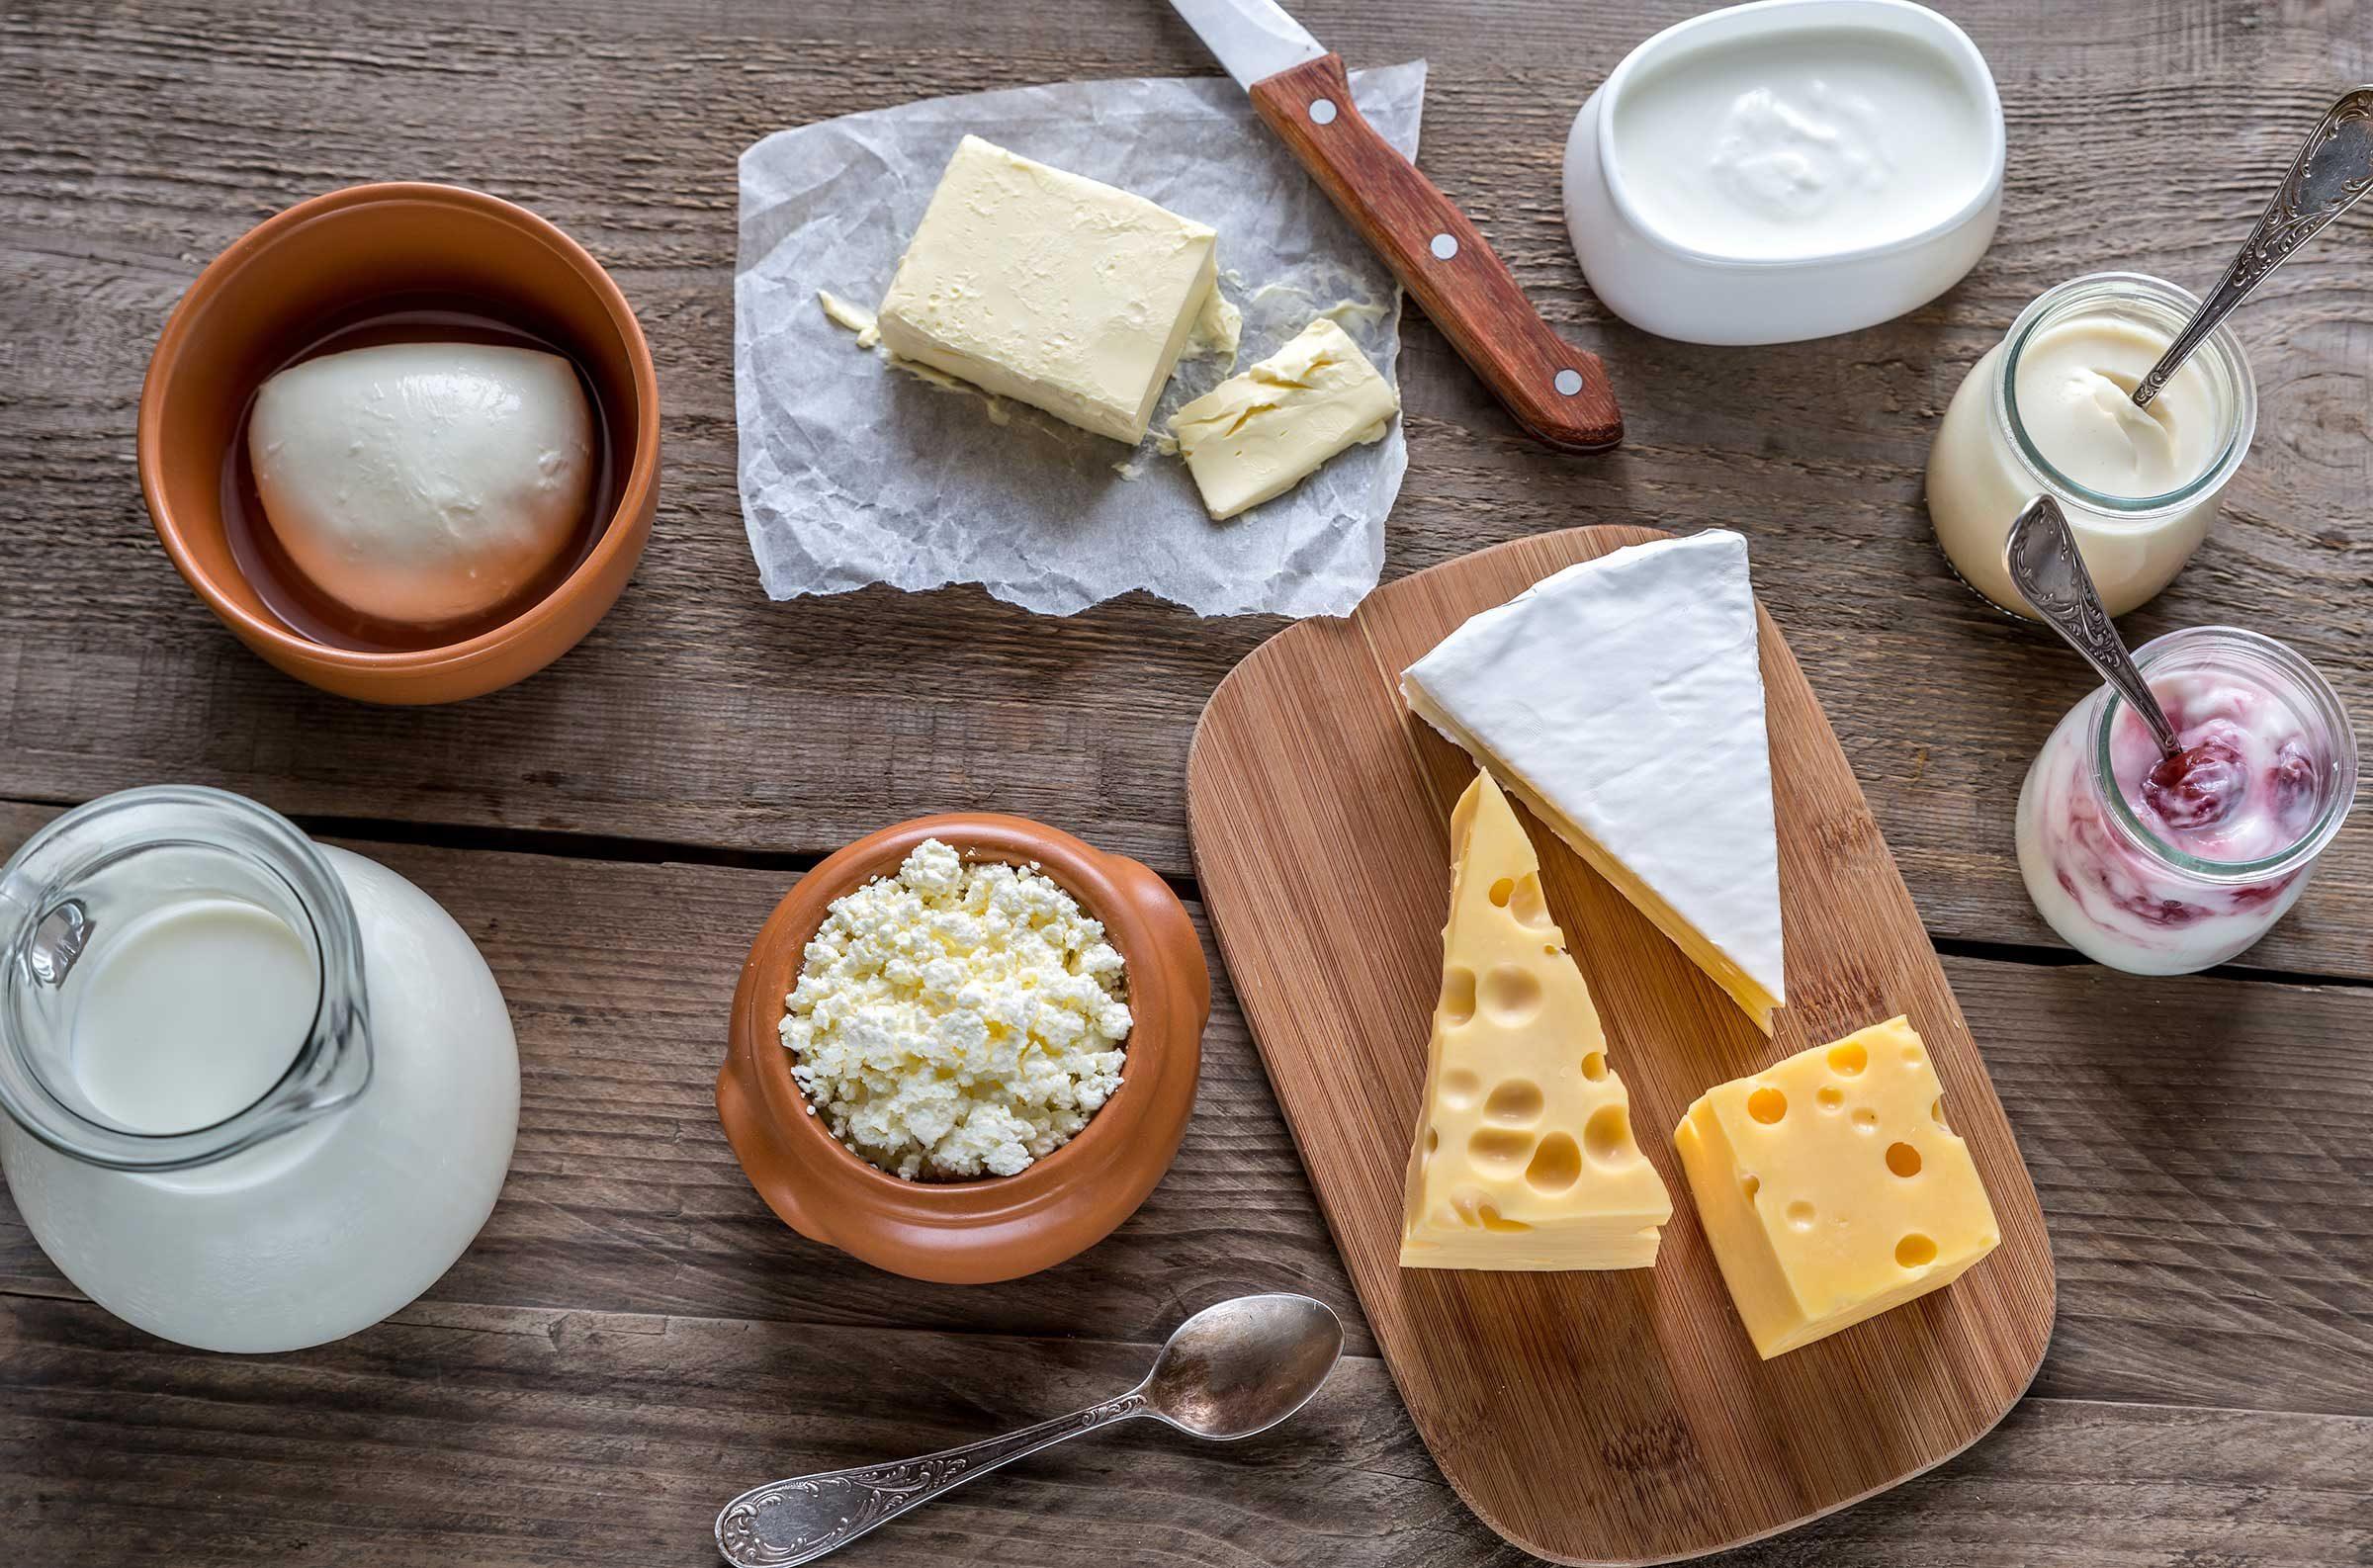 Minimize saturated fats